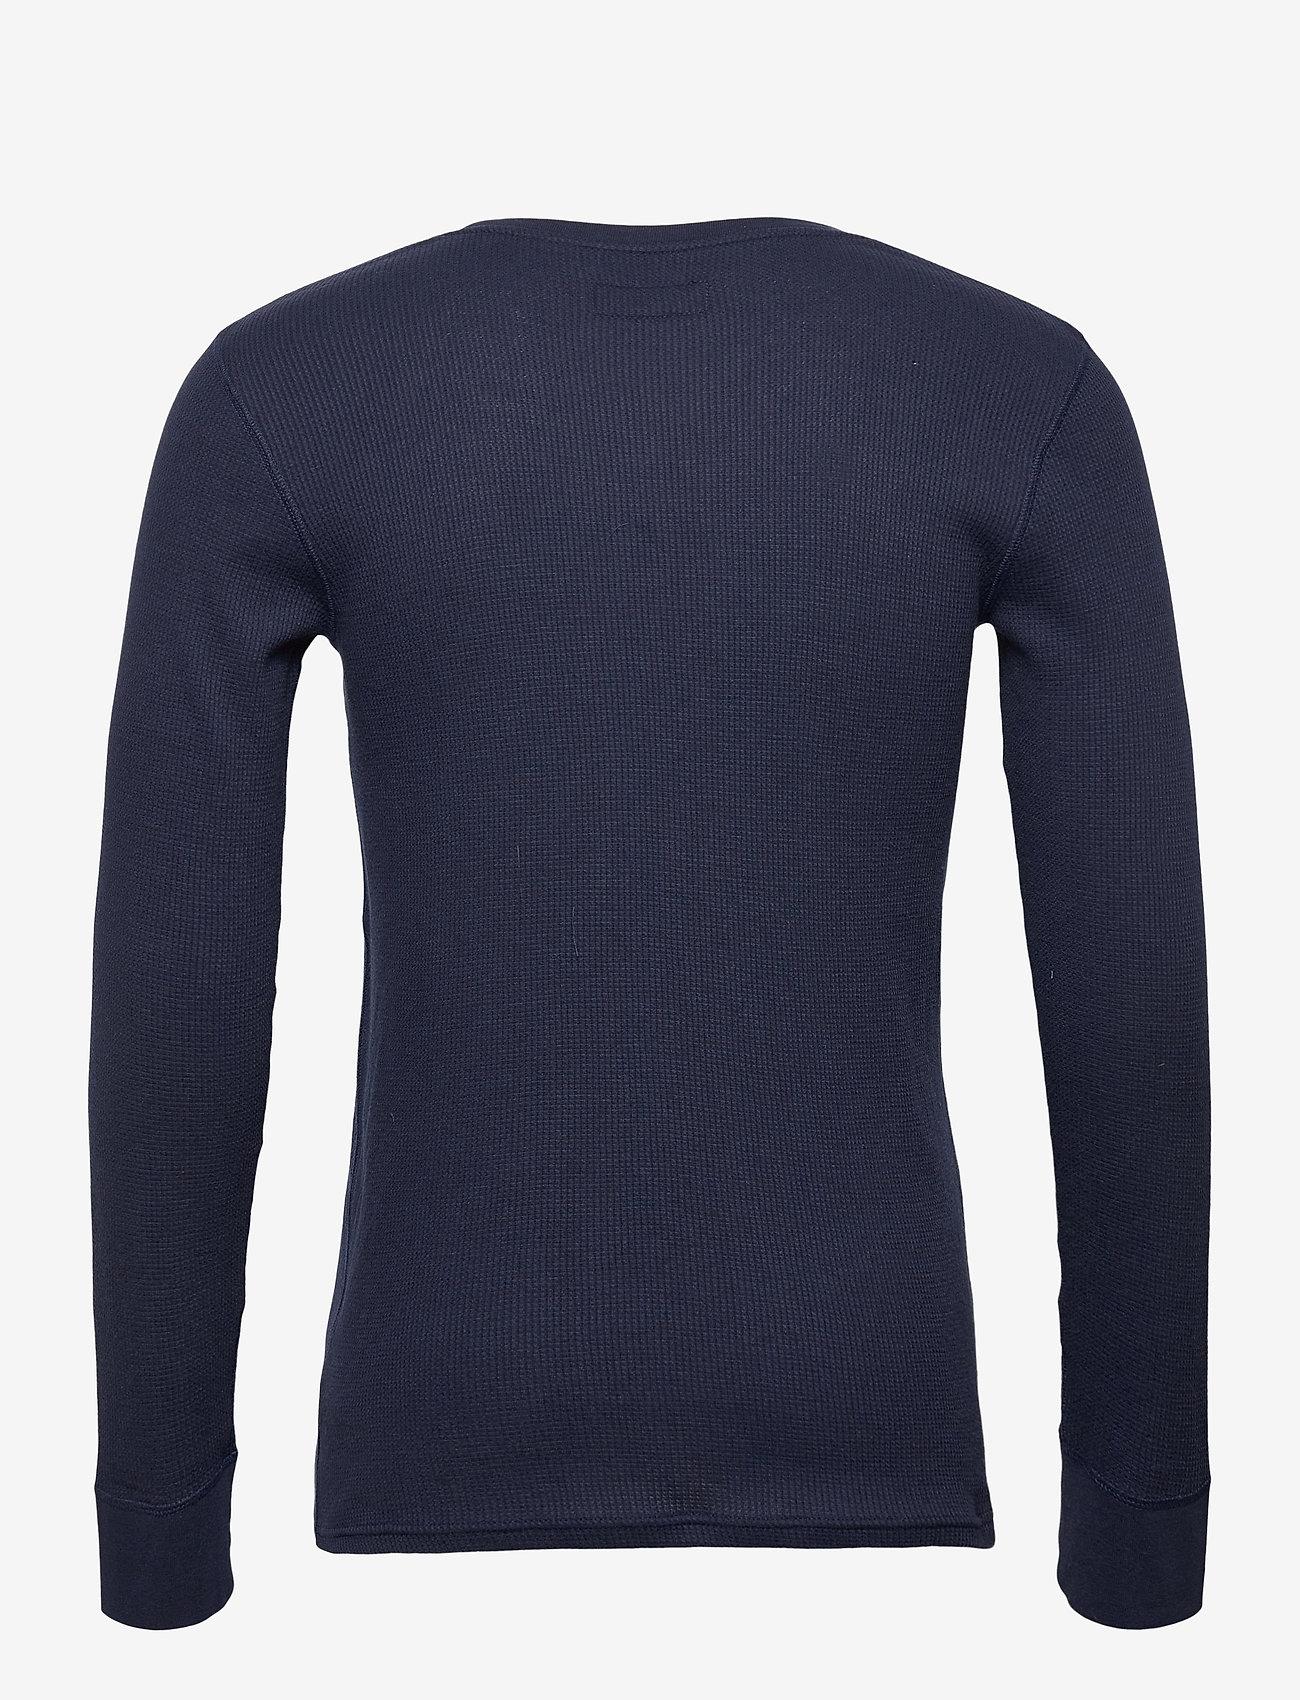 Polo Ralph Lauren Underwear - 0 - basic knitwear - cruise navy - 1